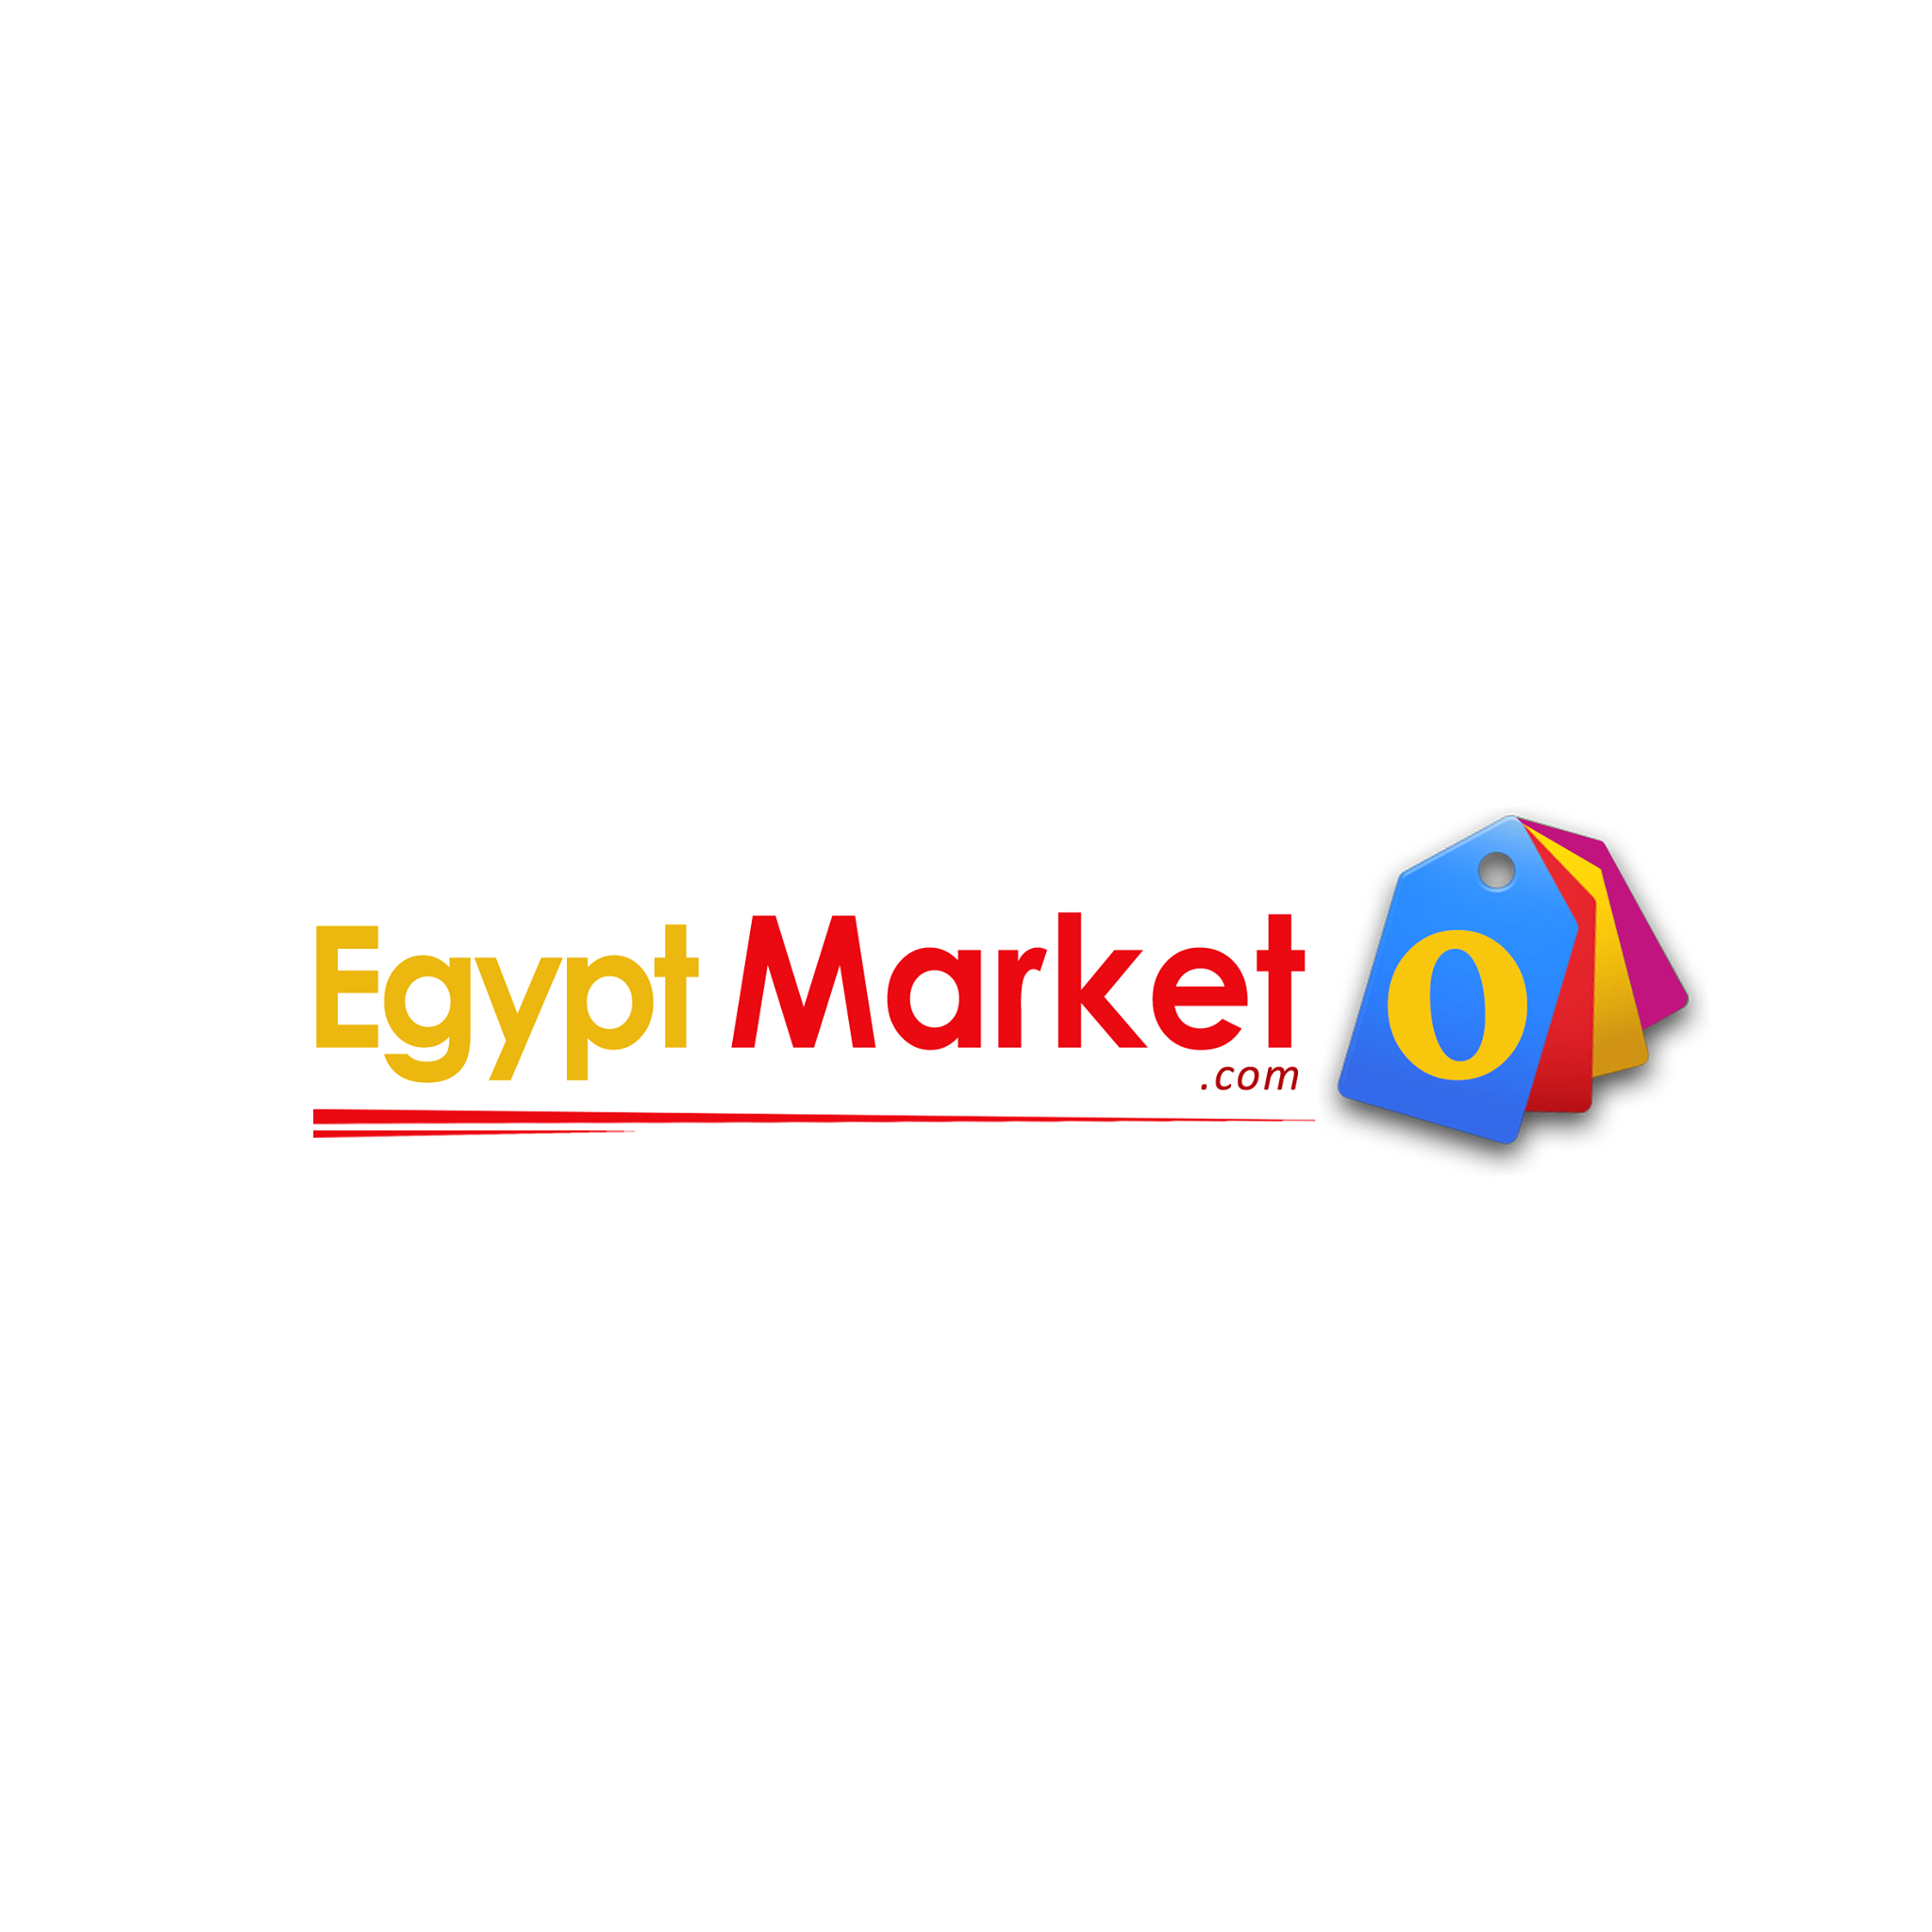 ايجيبت ماركيتو EgyptMarketo.com